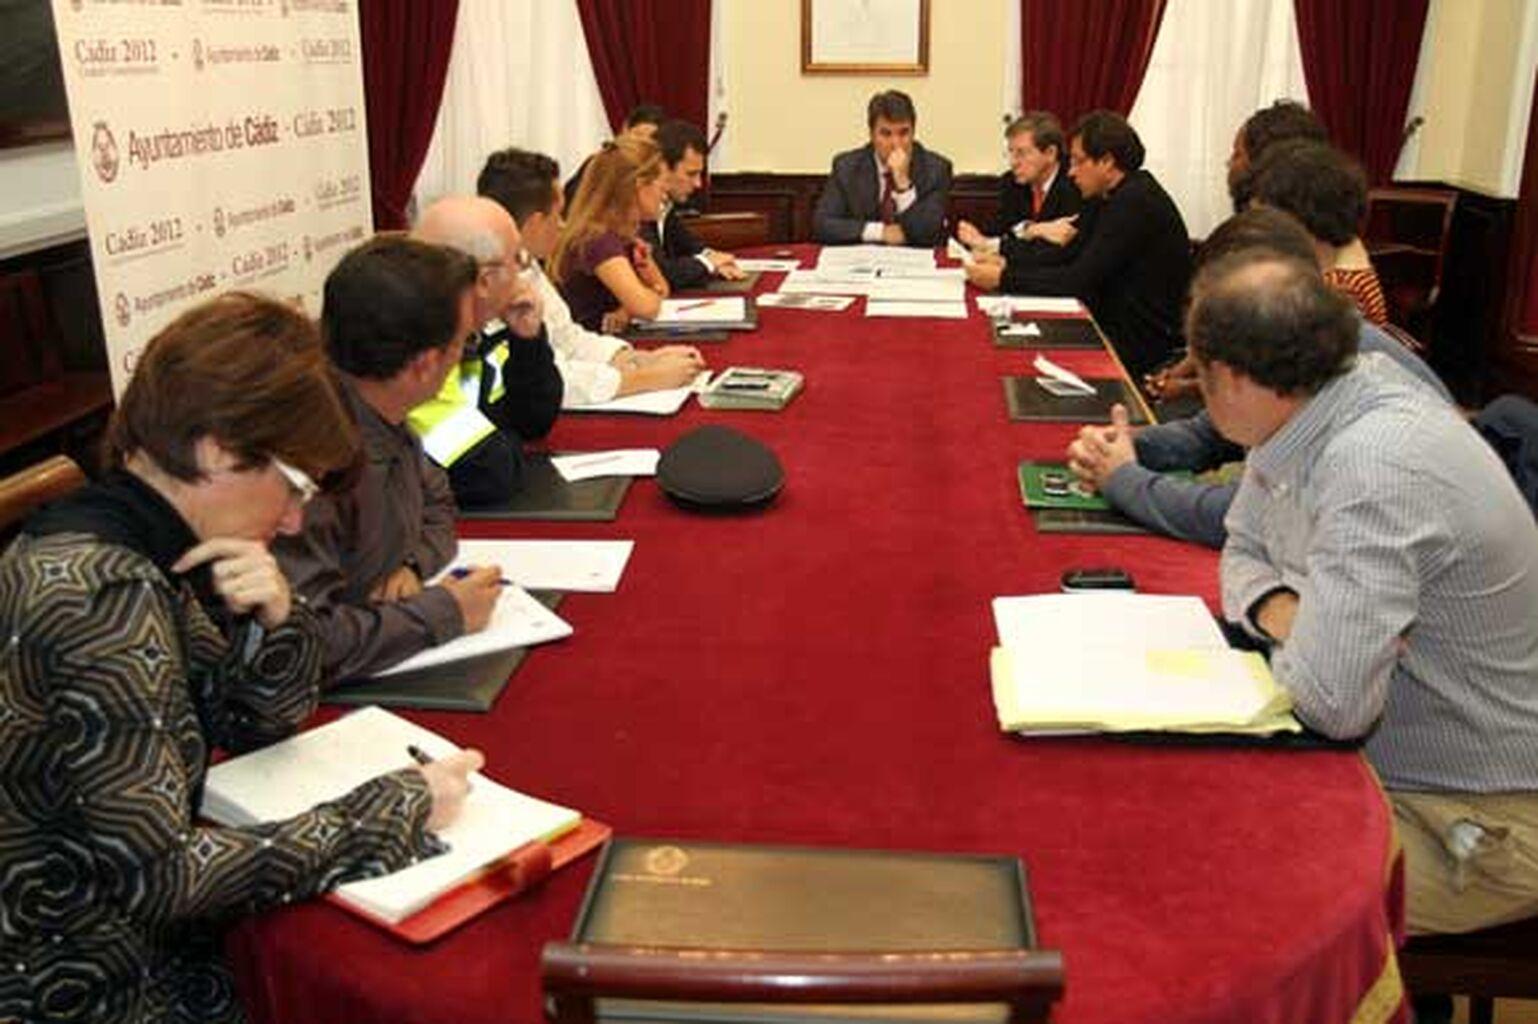 Autorizan reanudar mañana el rodaje de \'Knight and day\' en Cádiz